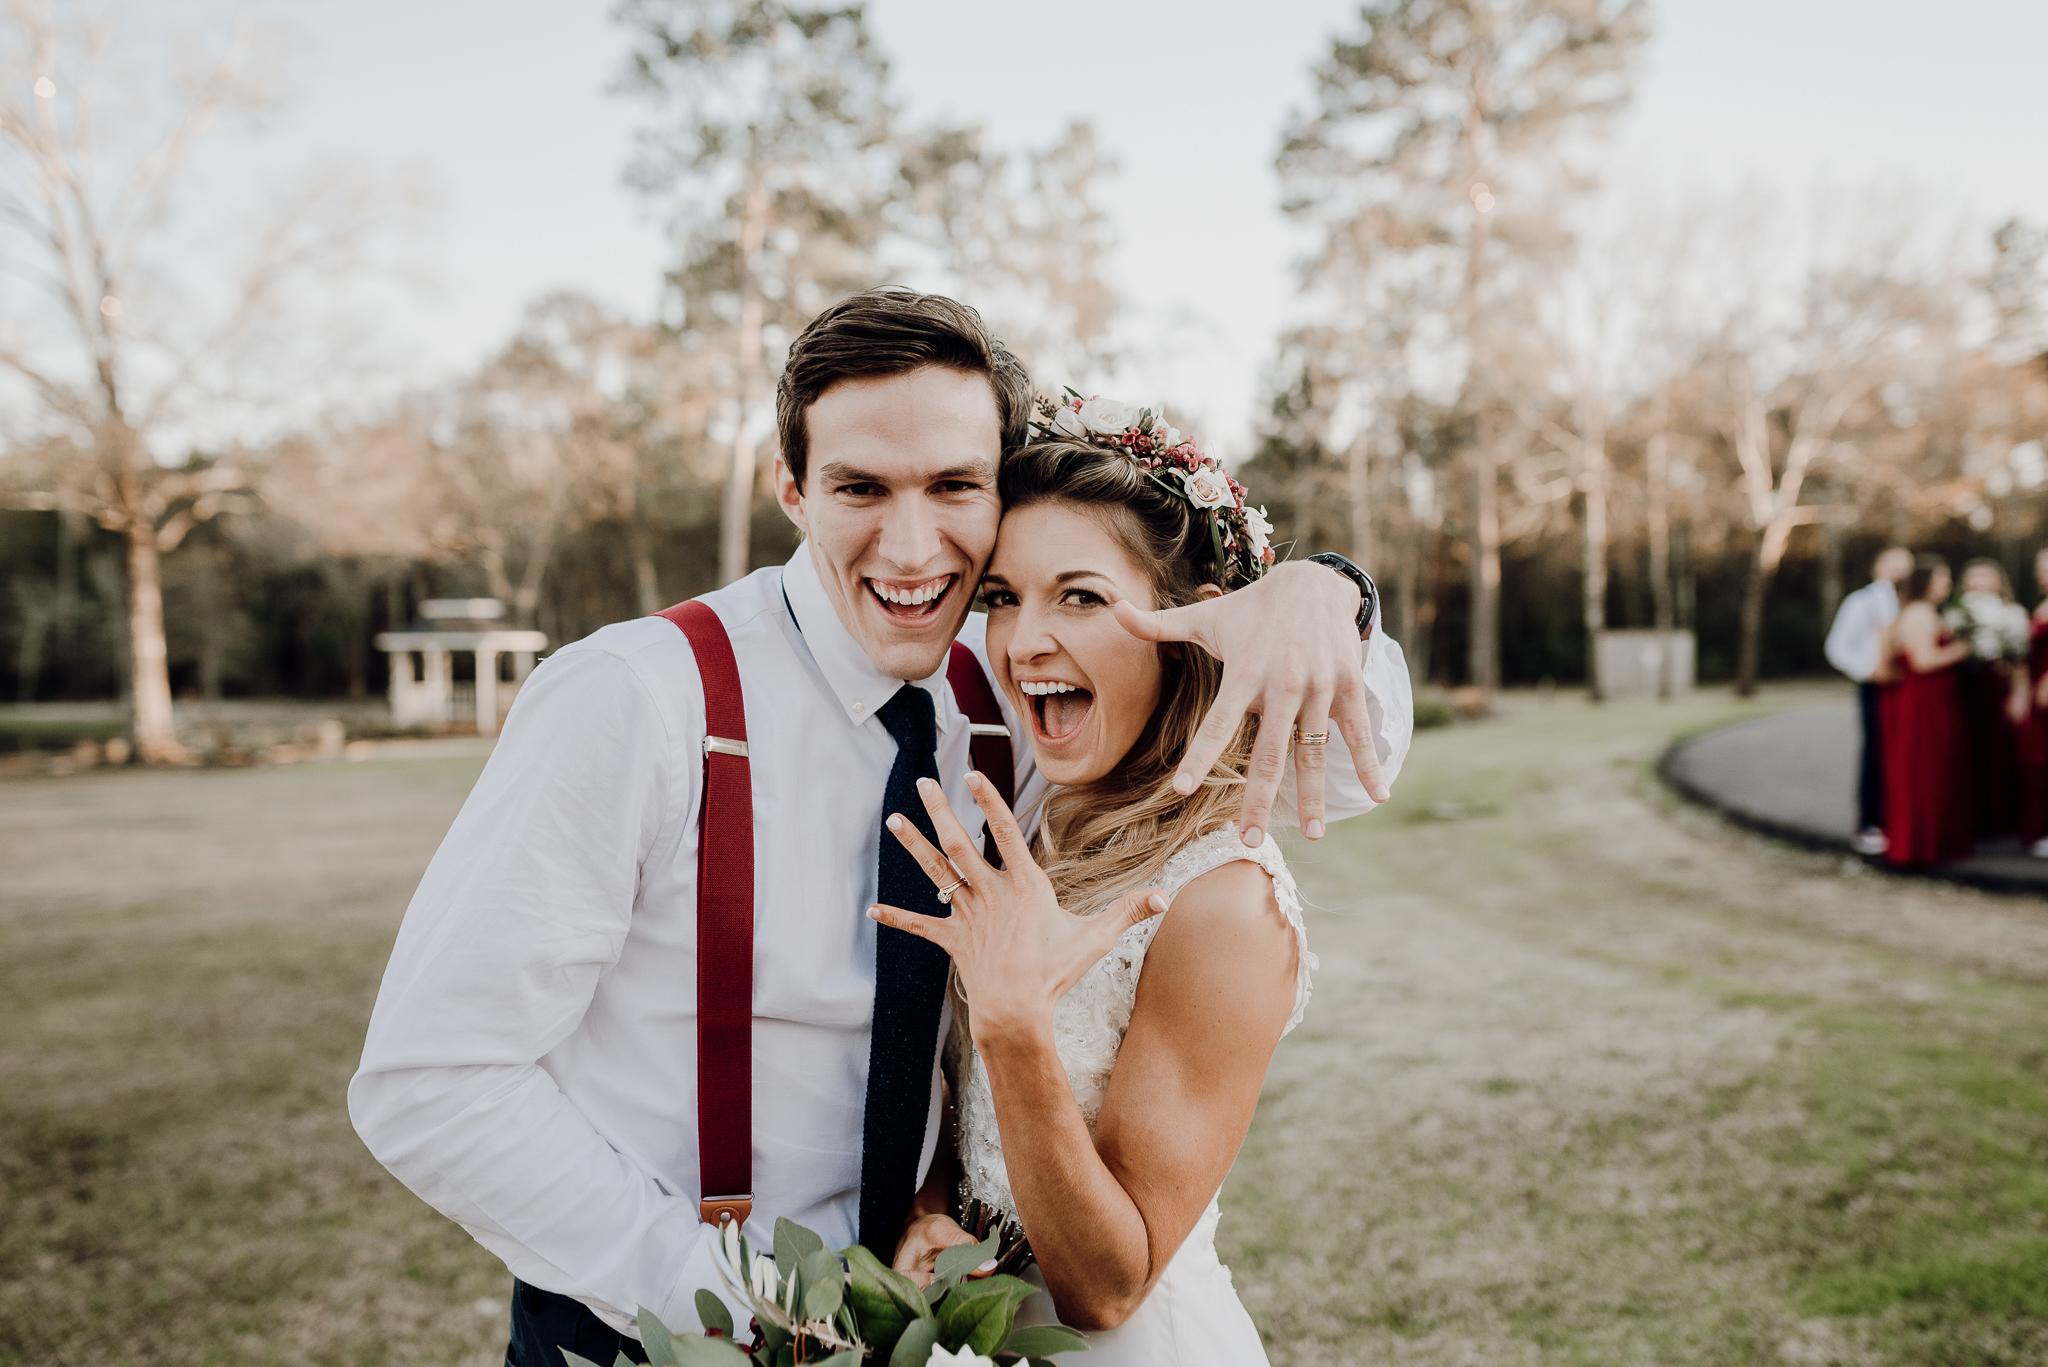 Michelle + Aron-Houston Wedding Photographer-Magnolia Meadows-Winter Wedding | Kristen Giles Photography - 055.jpg